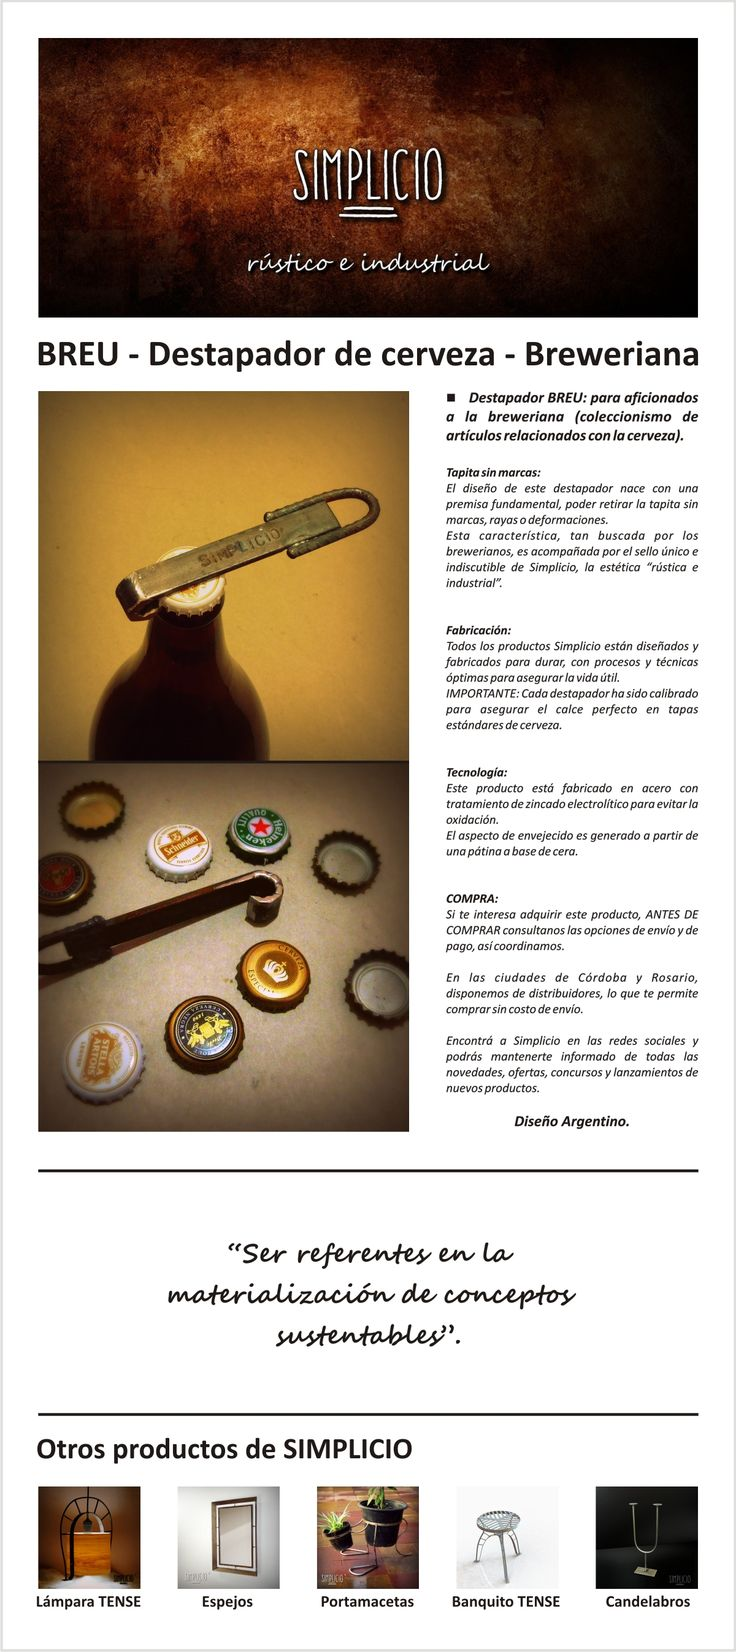 Folleto de venta - Destapador BREU - Breweriana